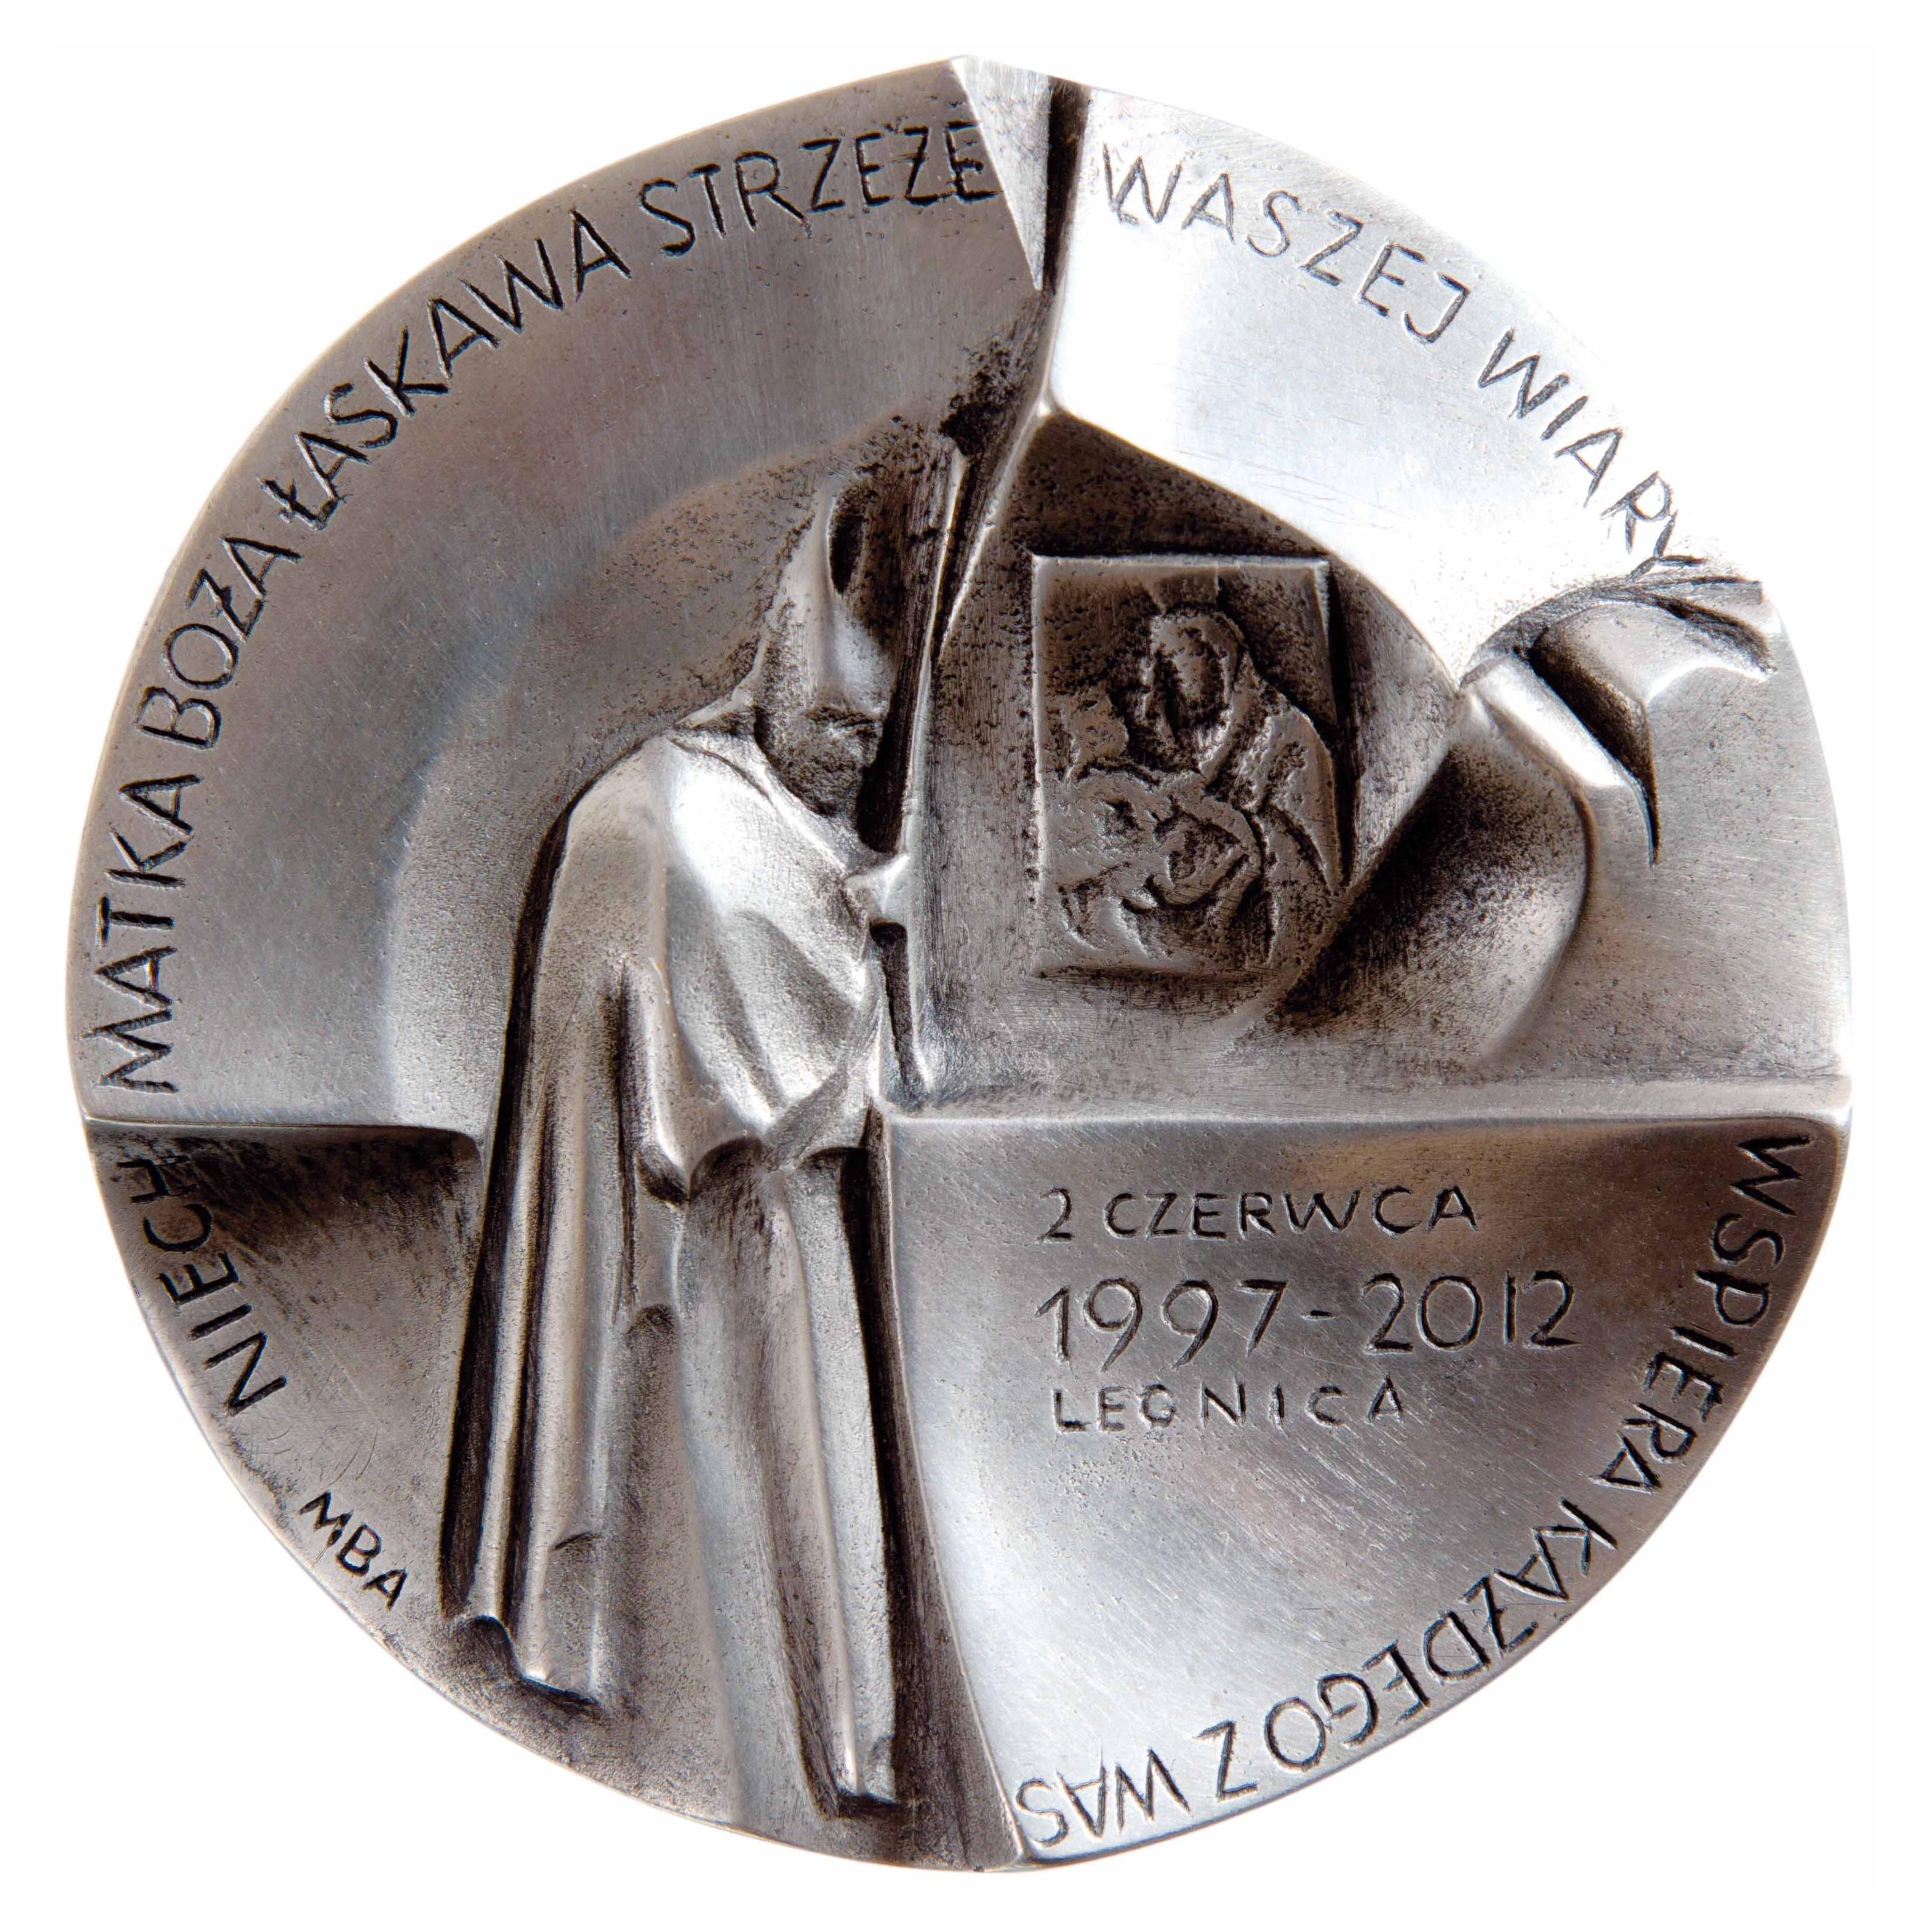 Magdalena Dobrucka, medal dwustronny (awers), lany, srebro, Φ 85 mm, 2012 r.